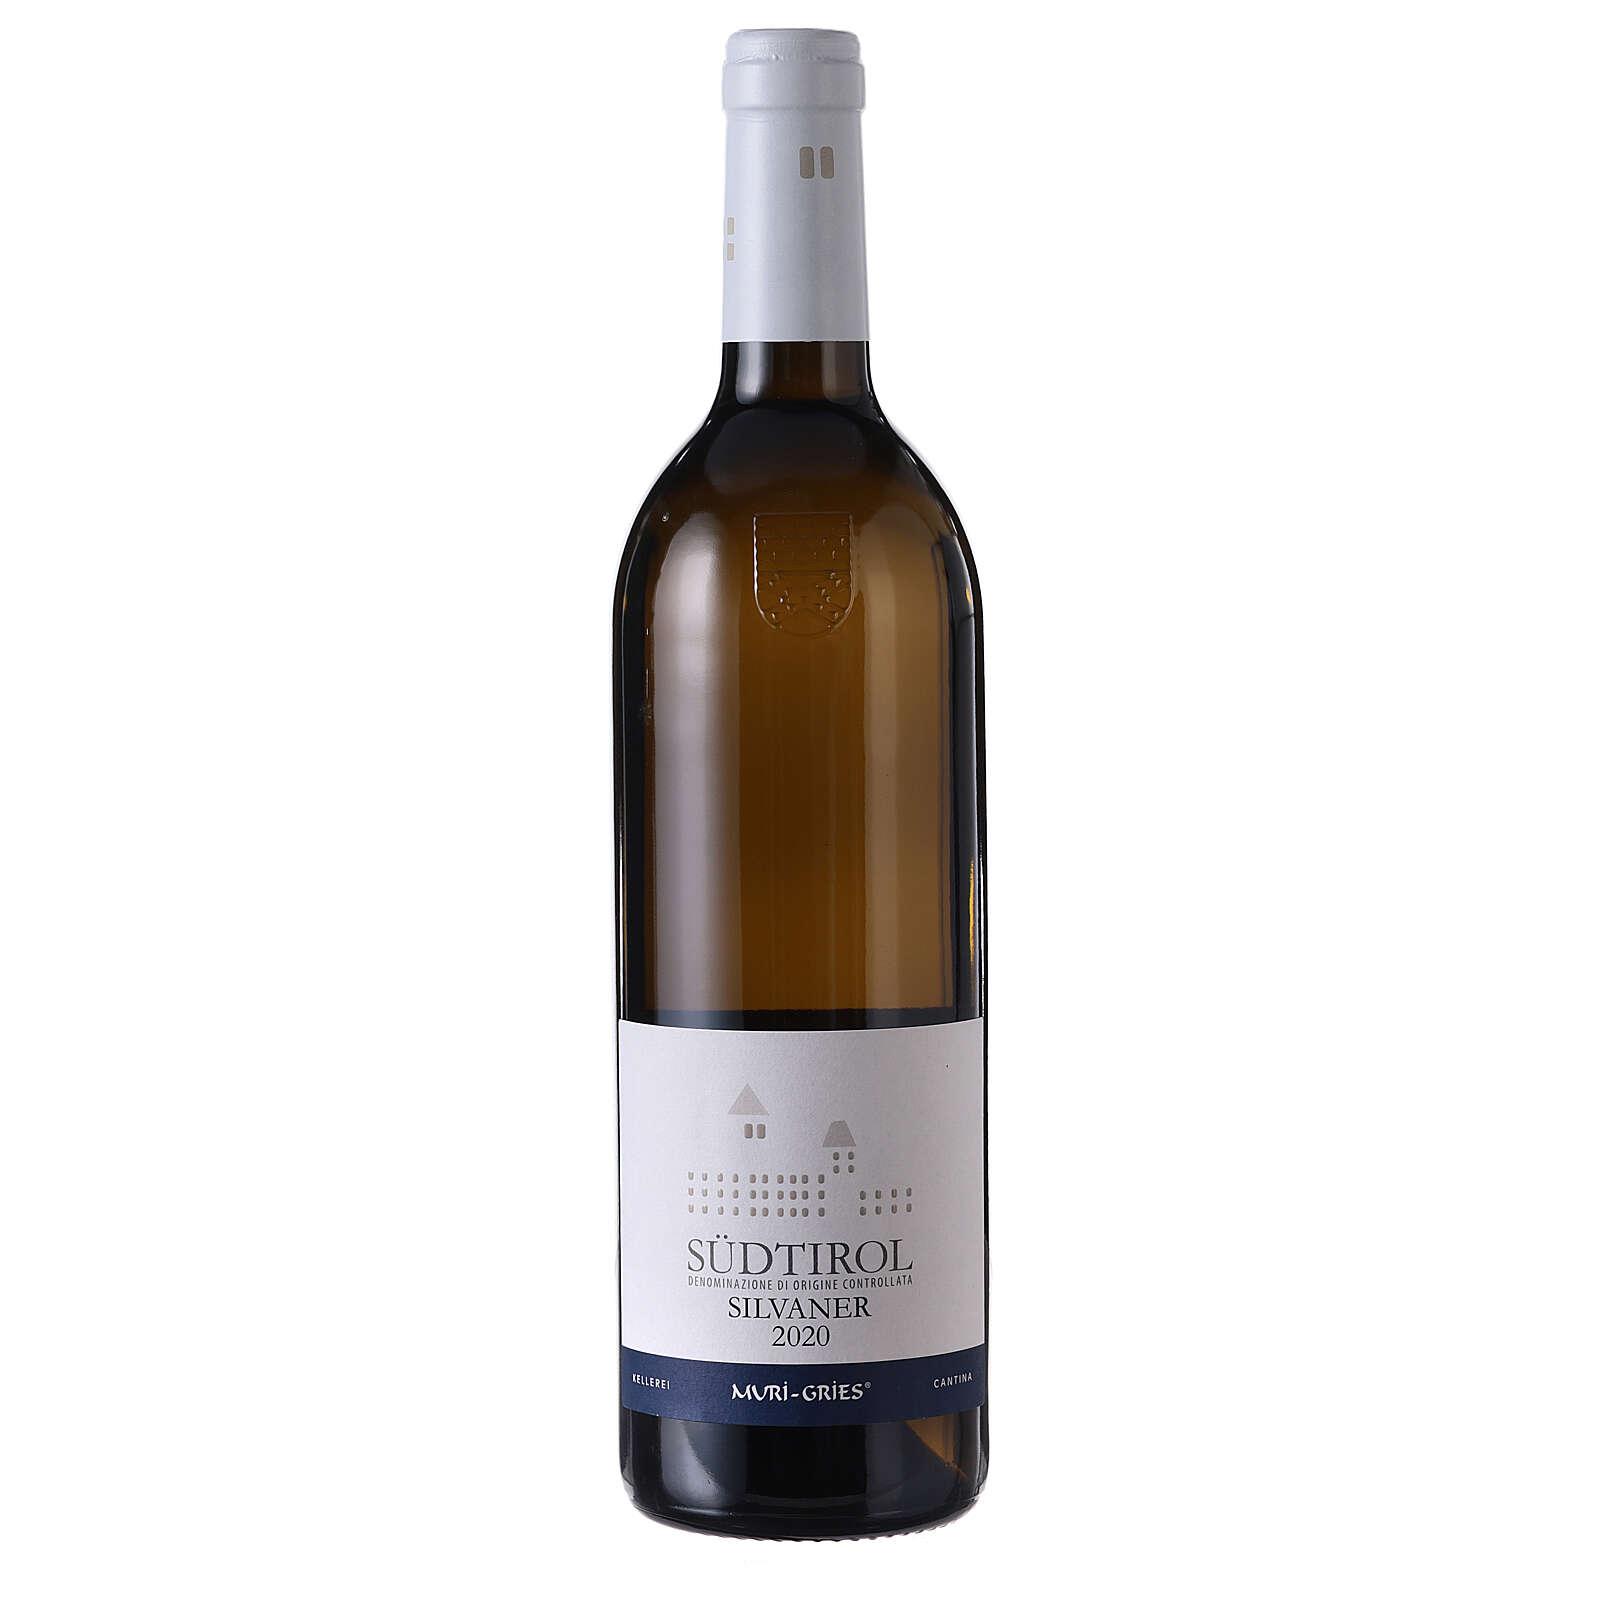 Vino Silvaner DOC 2020 Abadía Muri Gries 750 ml 3